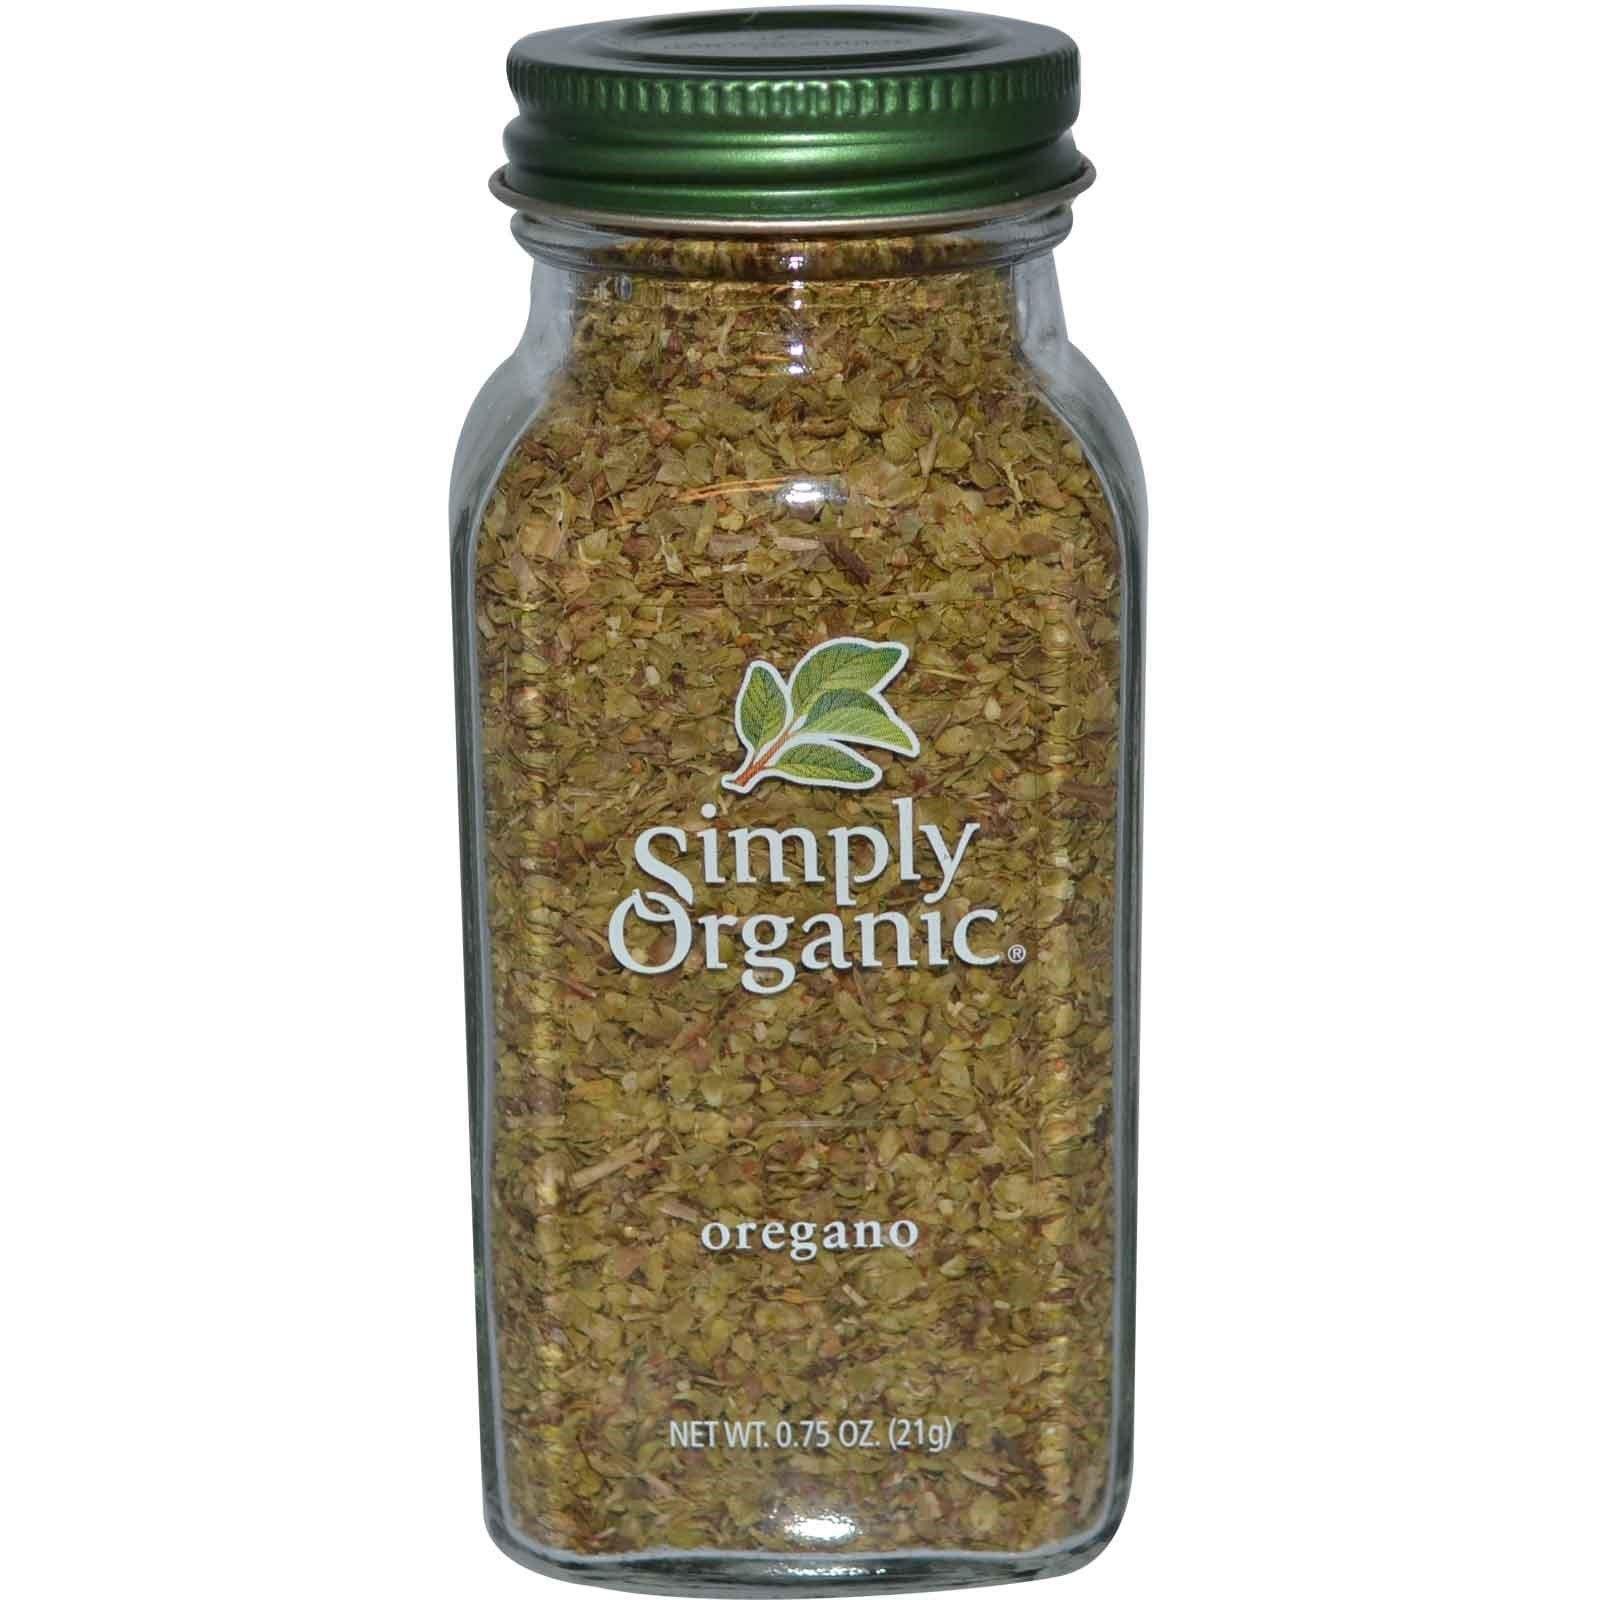 Simply Organic Ssnng Oregano Org Bttl